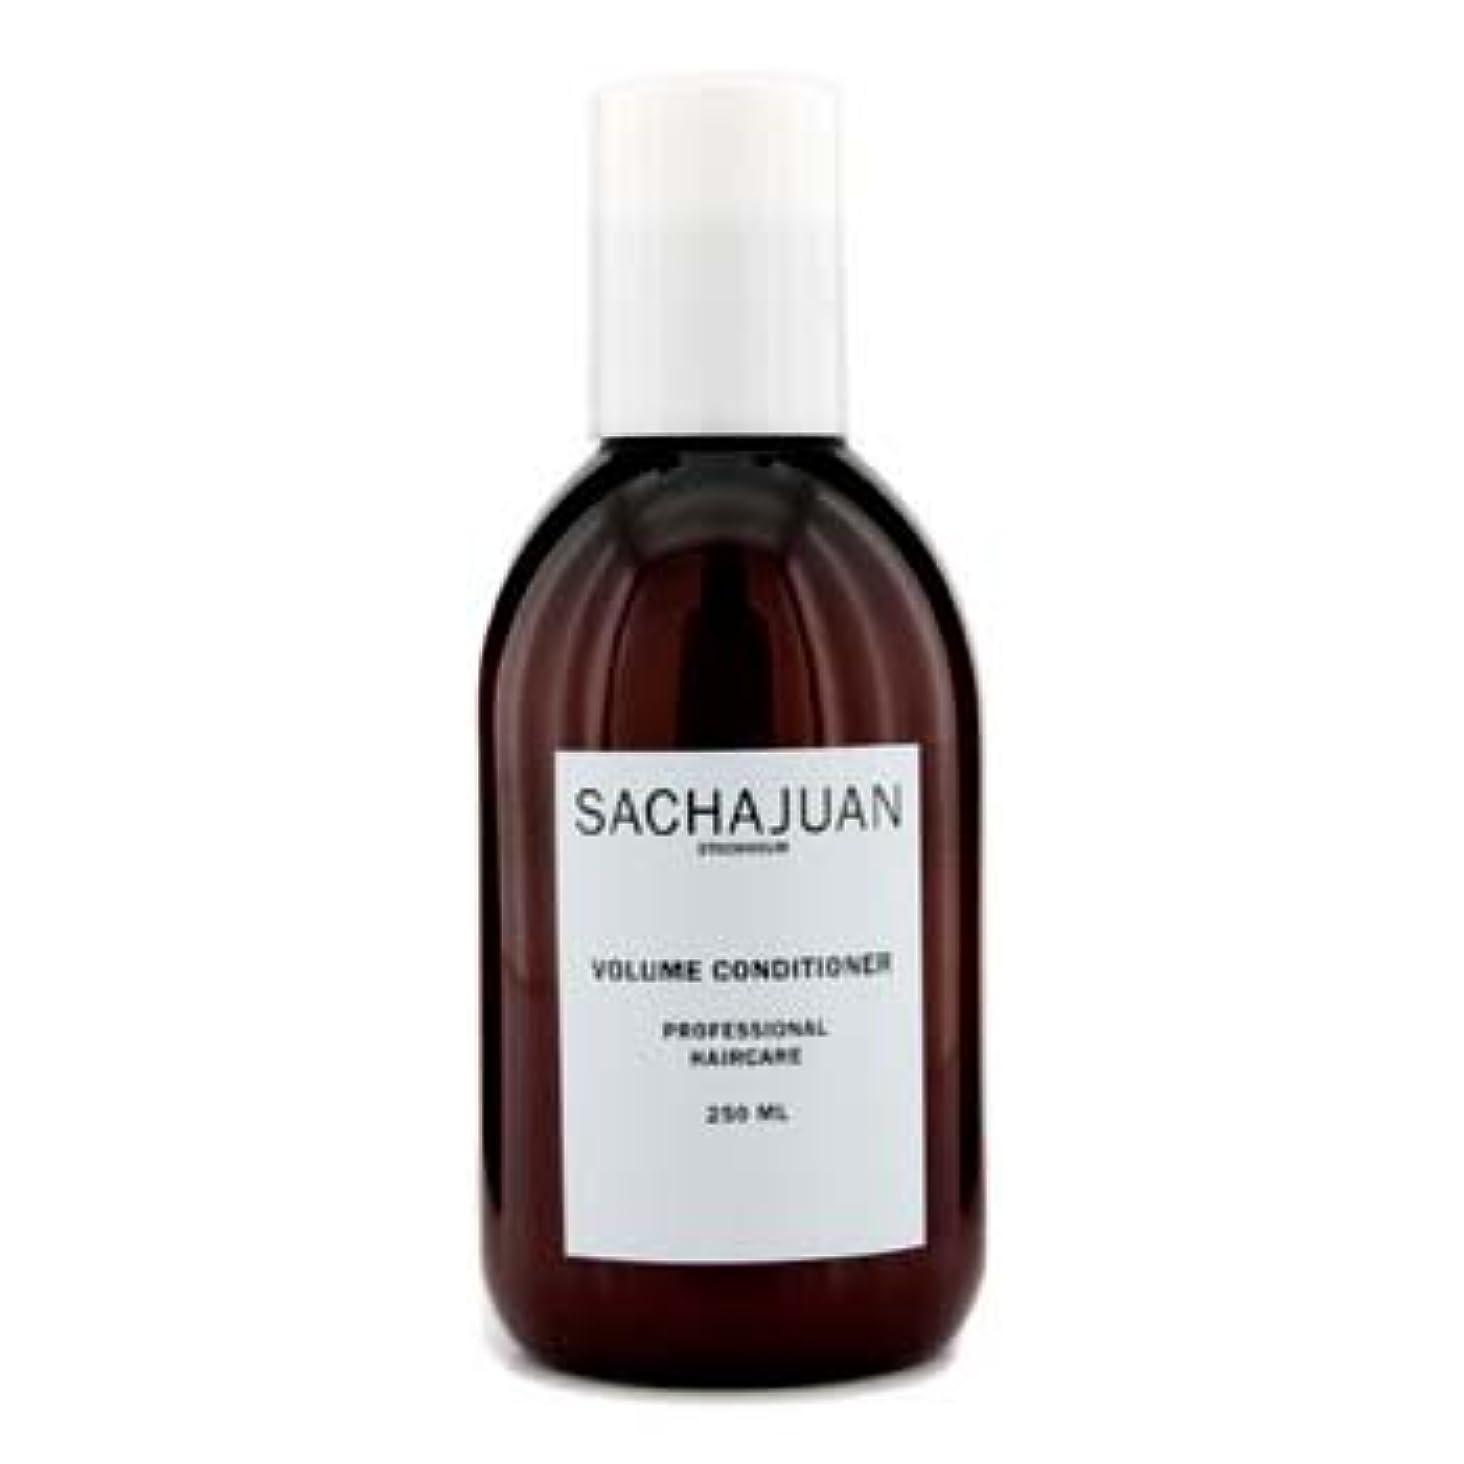 [Sachajuan] Volume Conditioner (For Fine and Sensitive Hair) 250ml/8.4oz